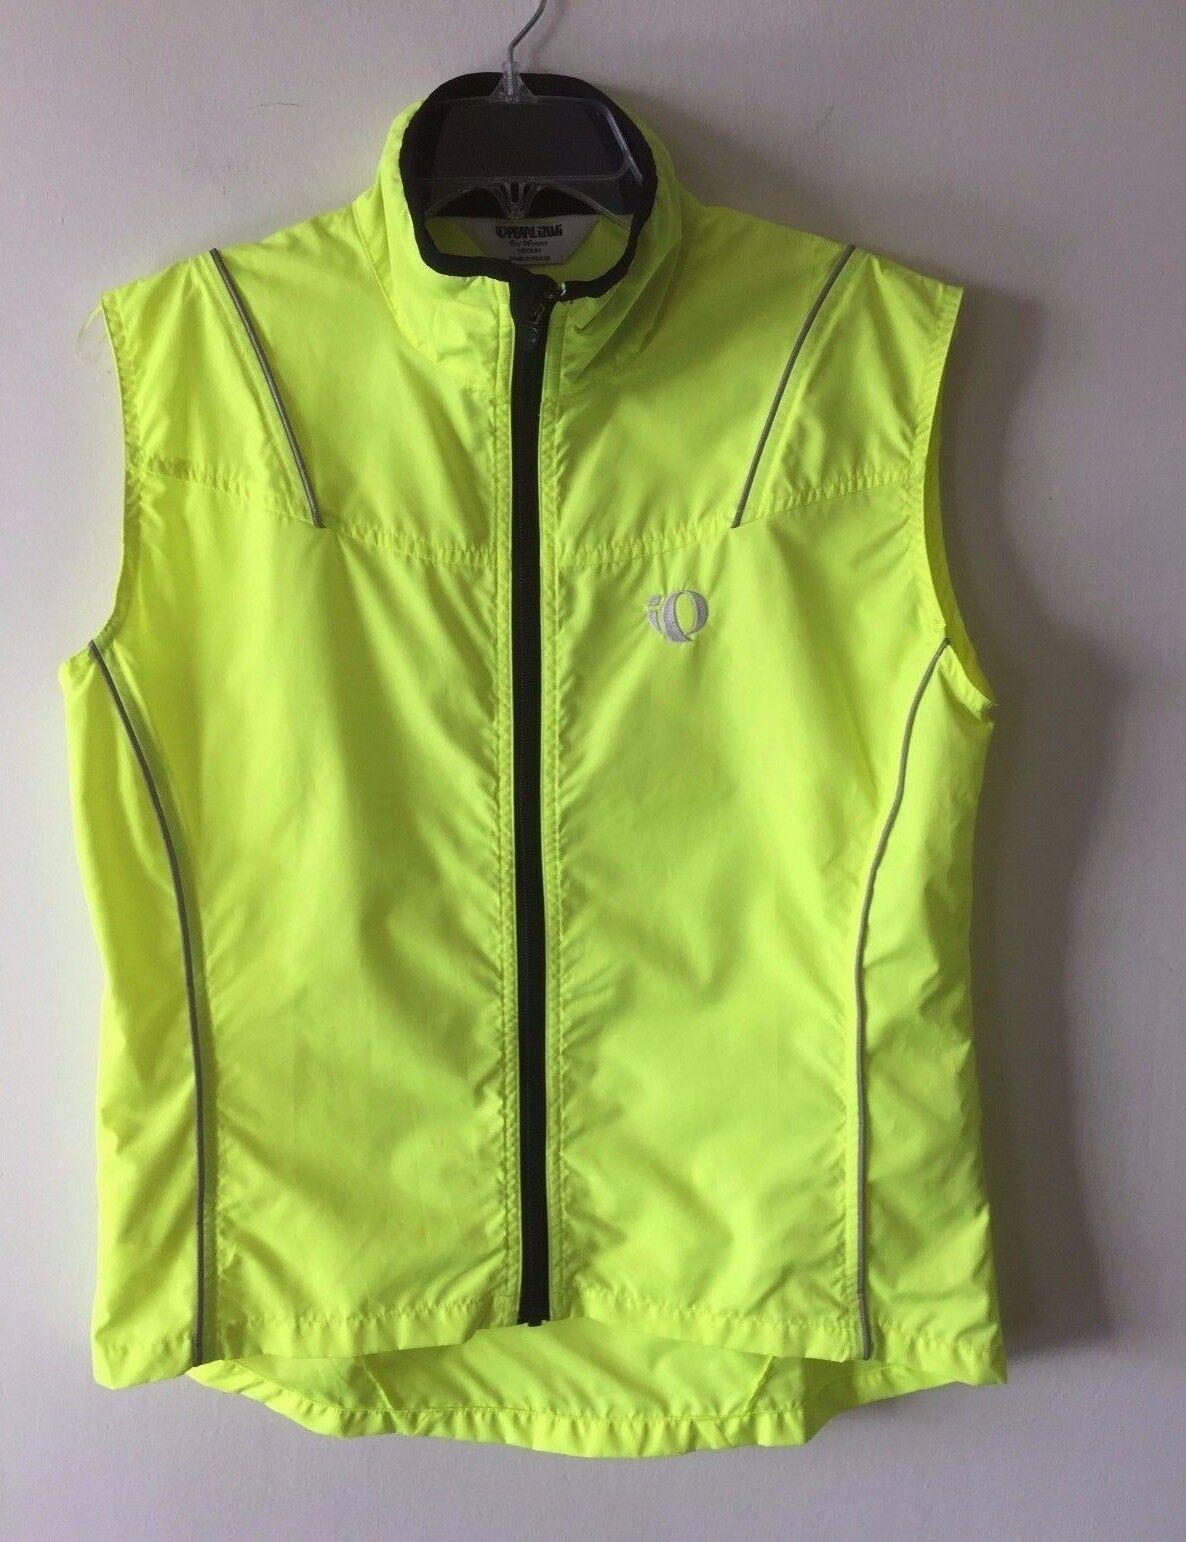 Pearl Izumi Elite Cycling Vest Mesh Zippered Screaming Yellow Women's M NWOT